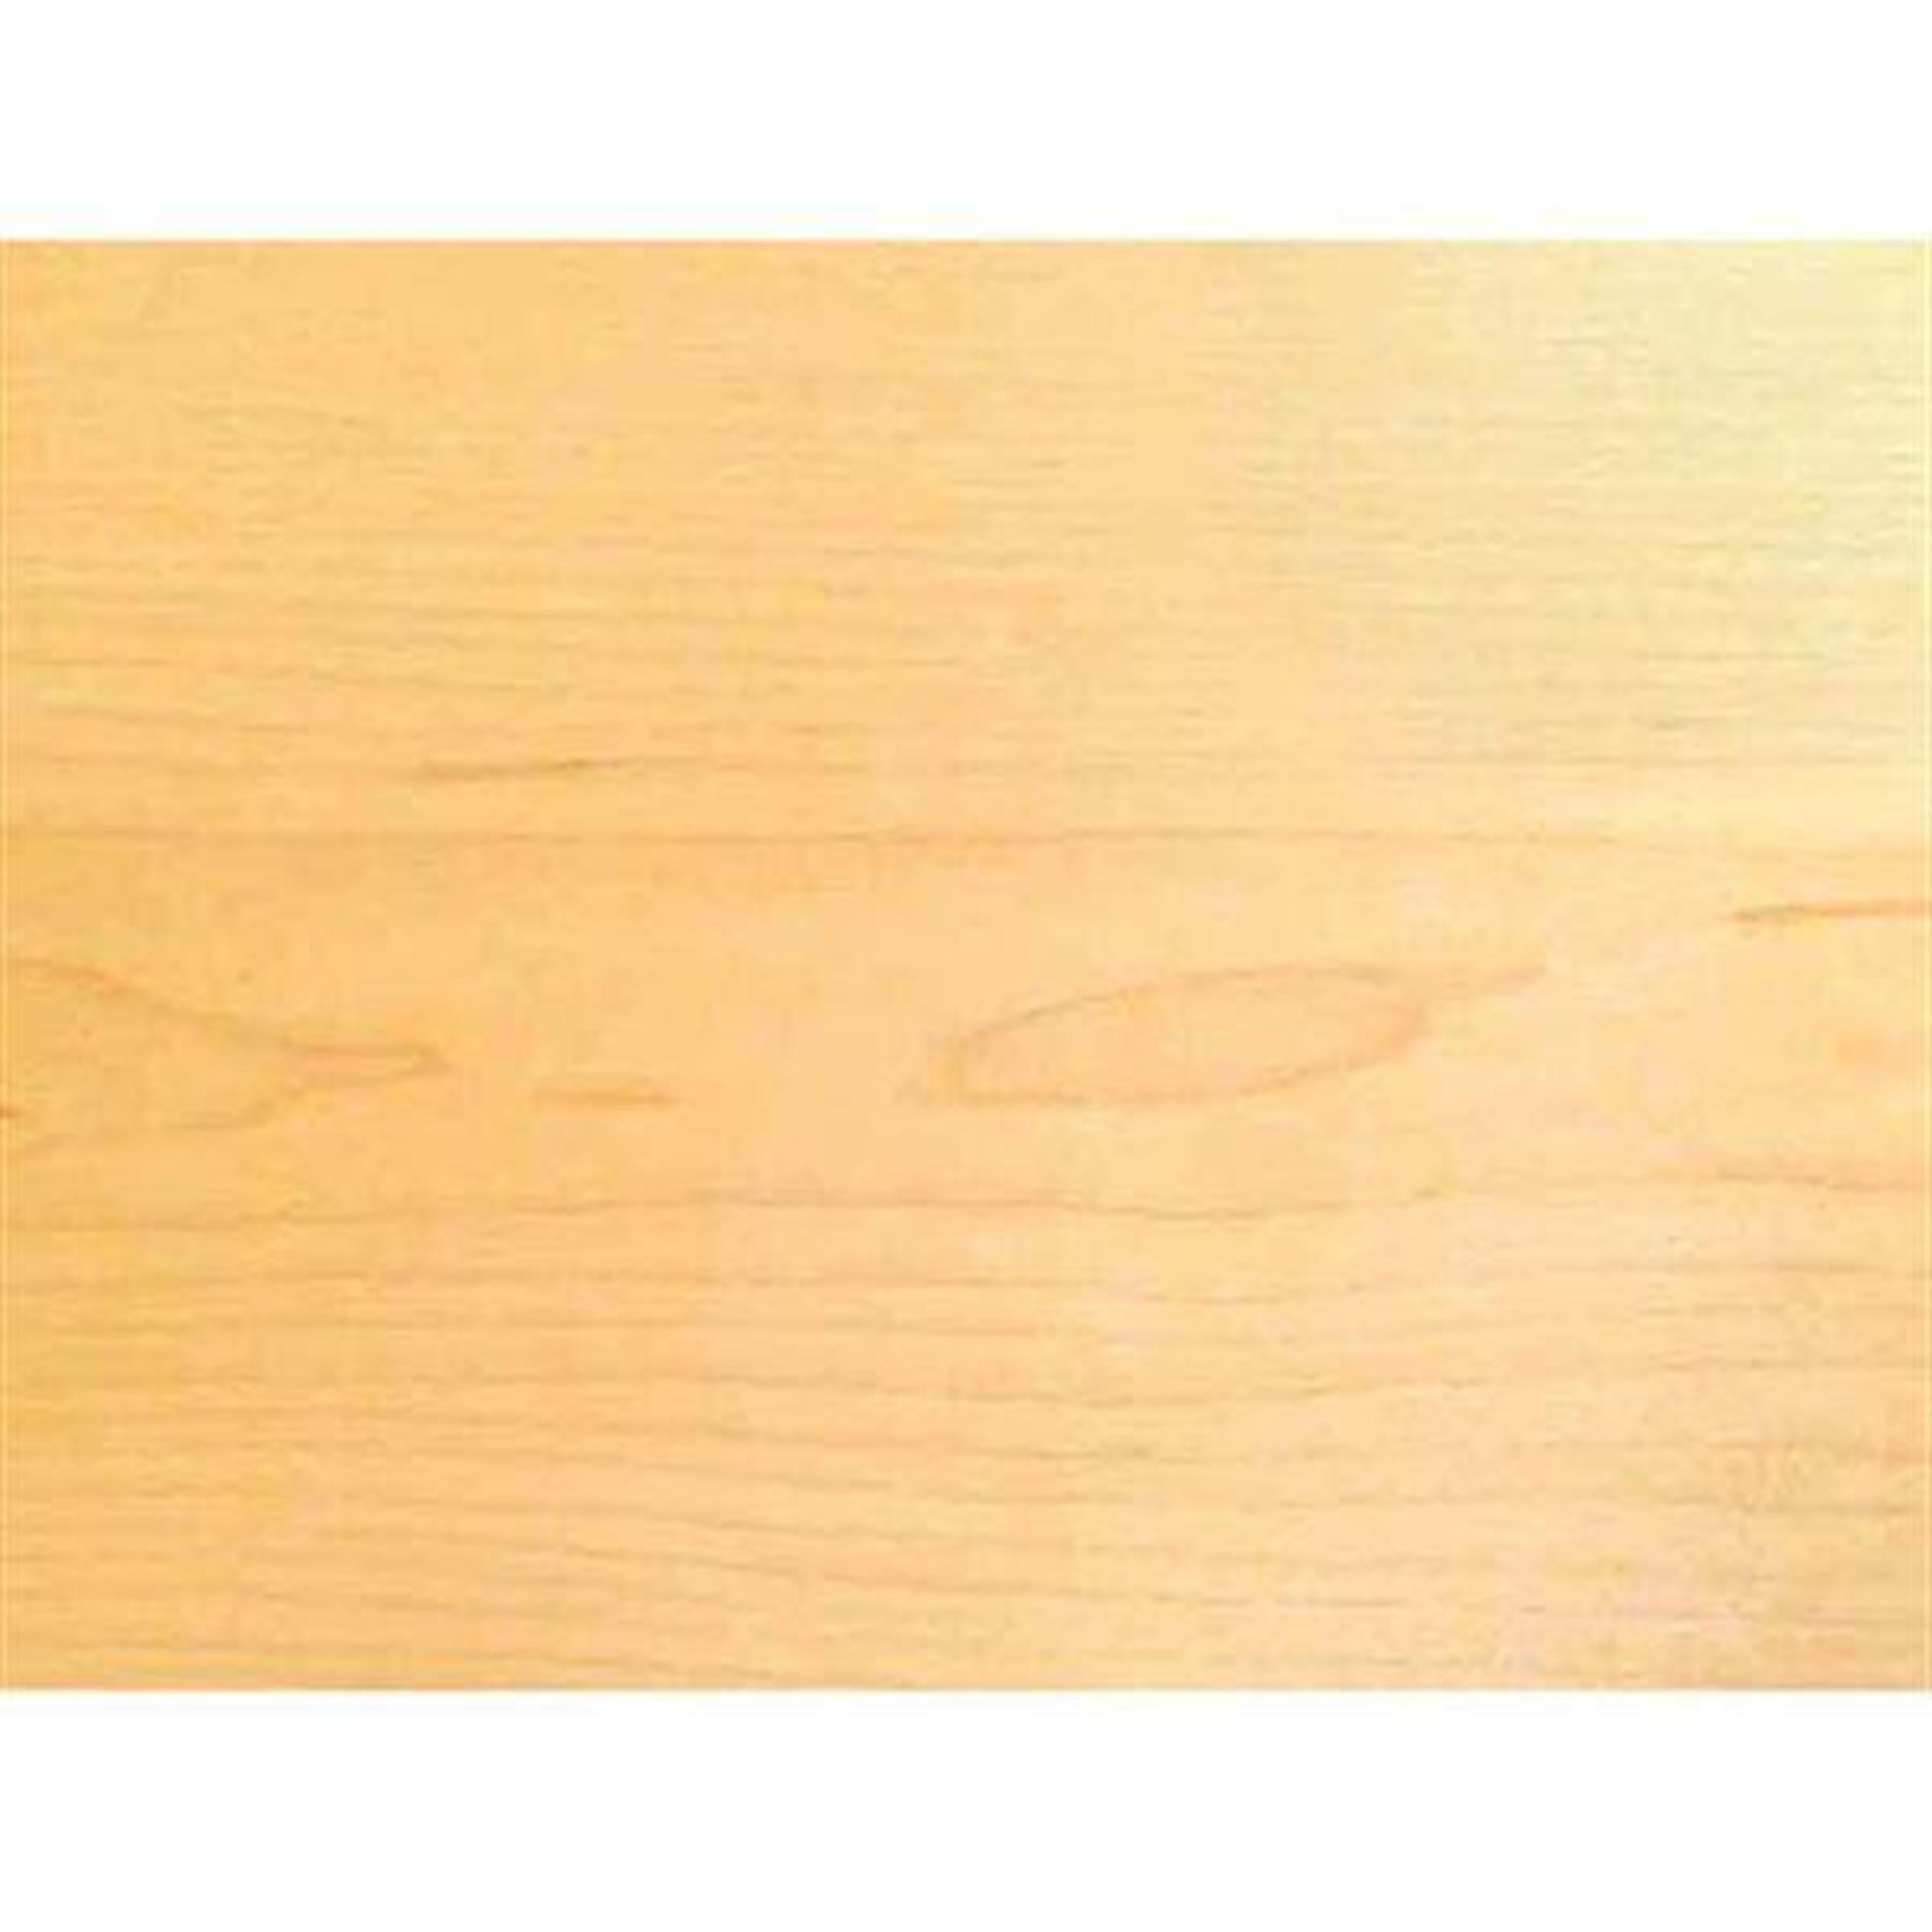 Maple 2' x 8' 3M? PSA Backed Flat Cut Wood Veneer